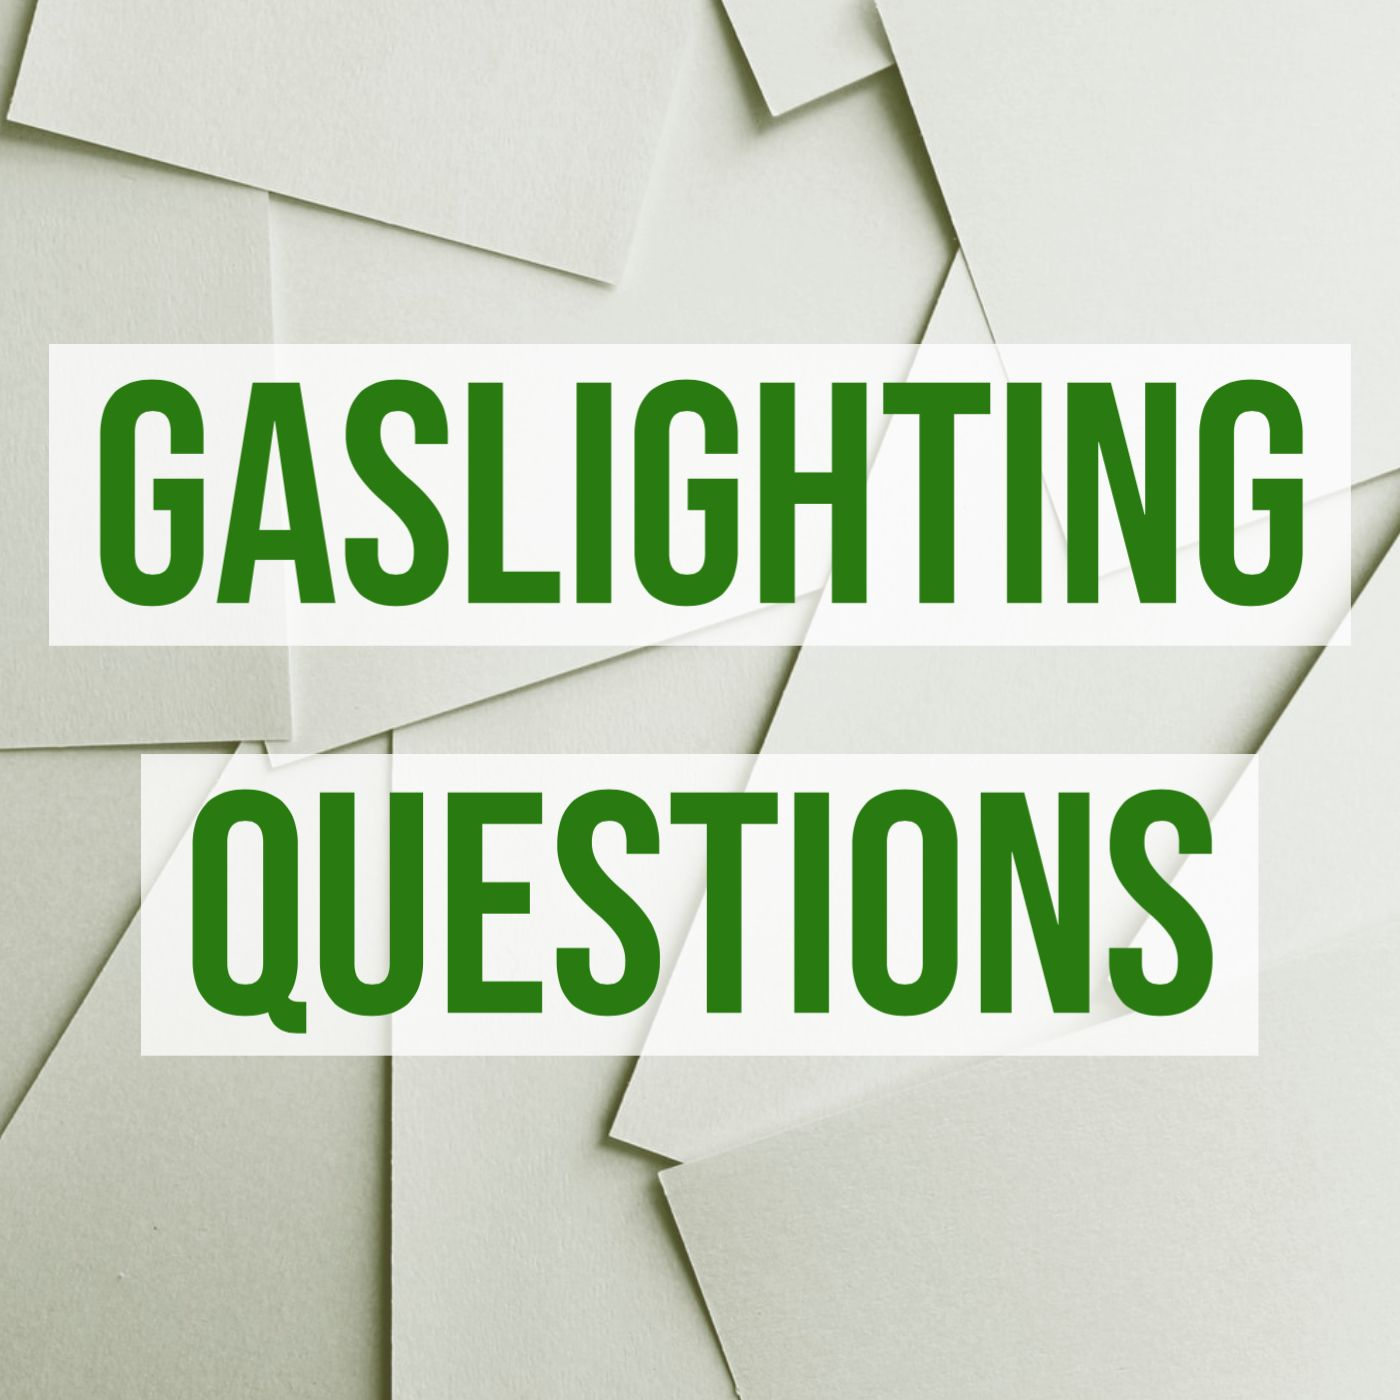 Gaslighting Questions